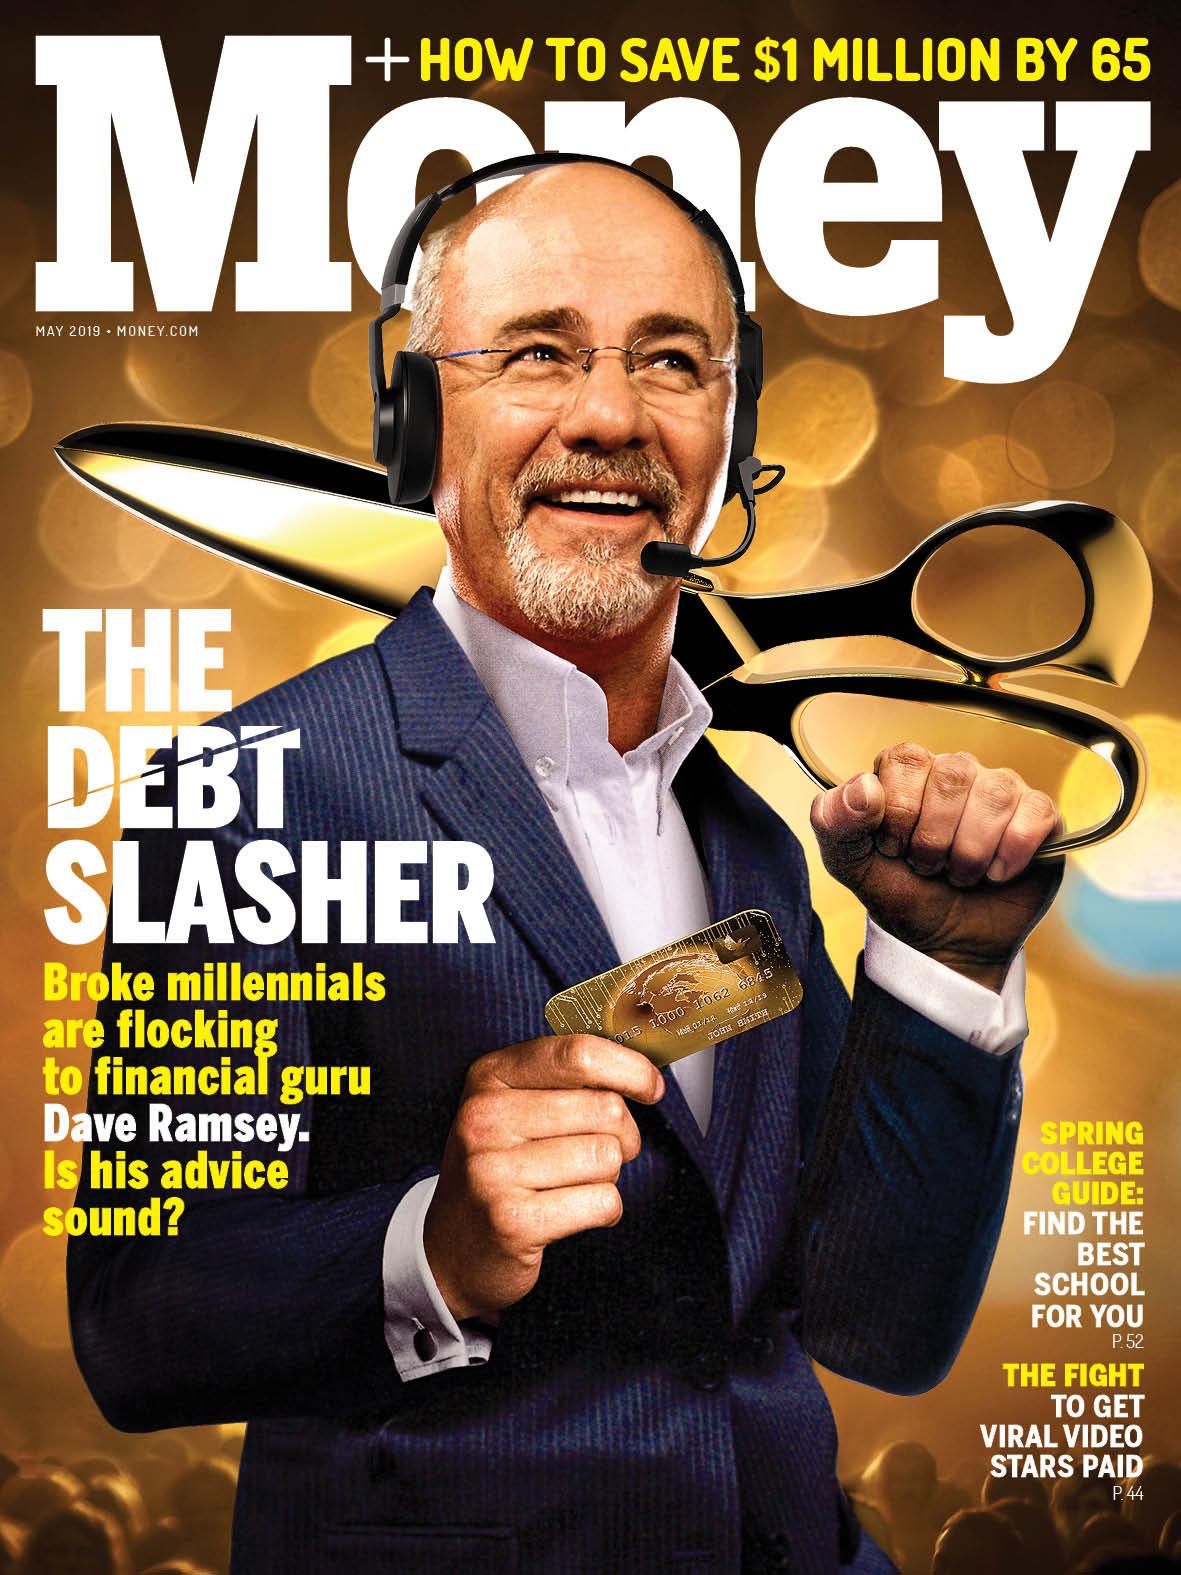 The Debt Slasher